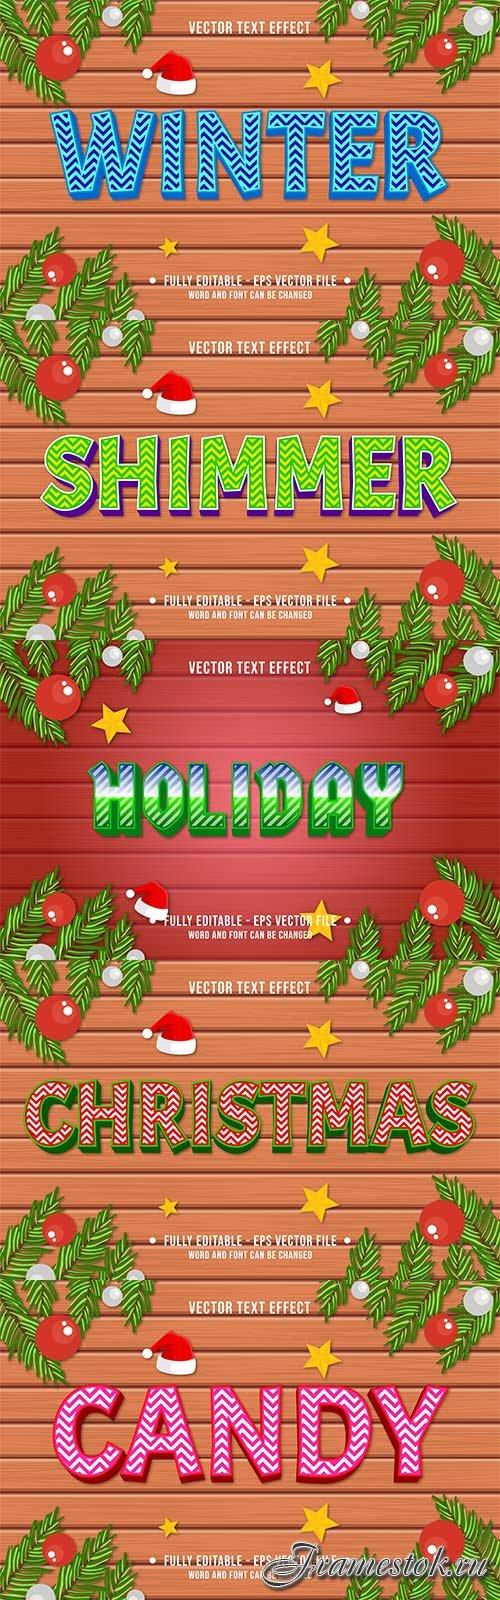 2022 New year, Merry christmas editable text effect premium vector vol 18